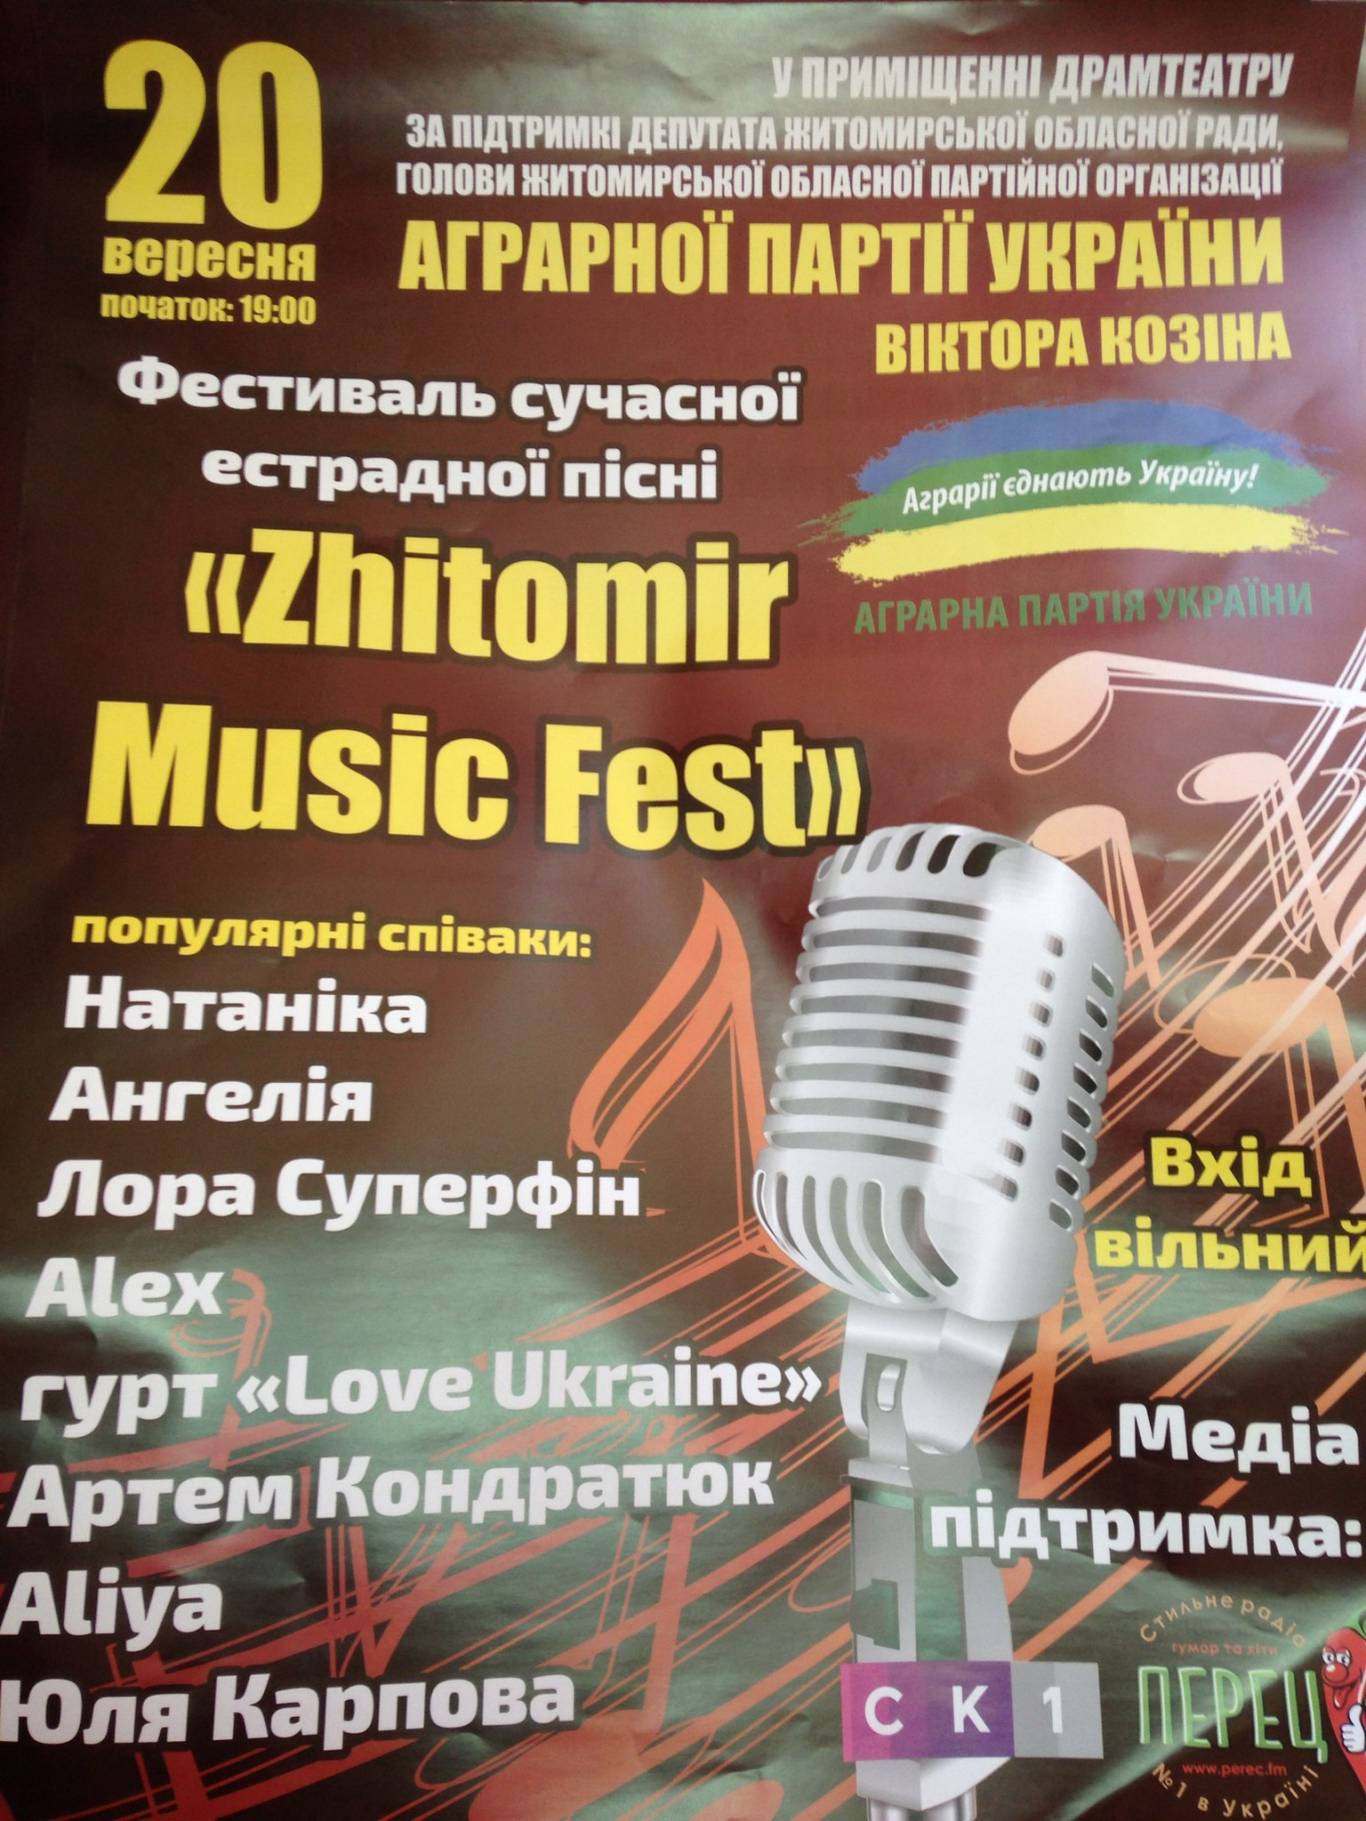 Zhitomir music fest